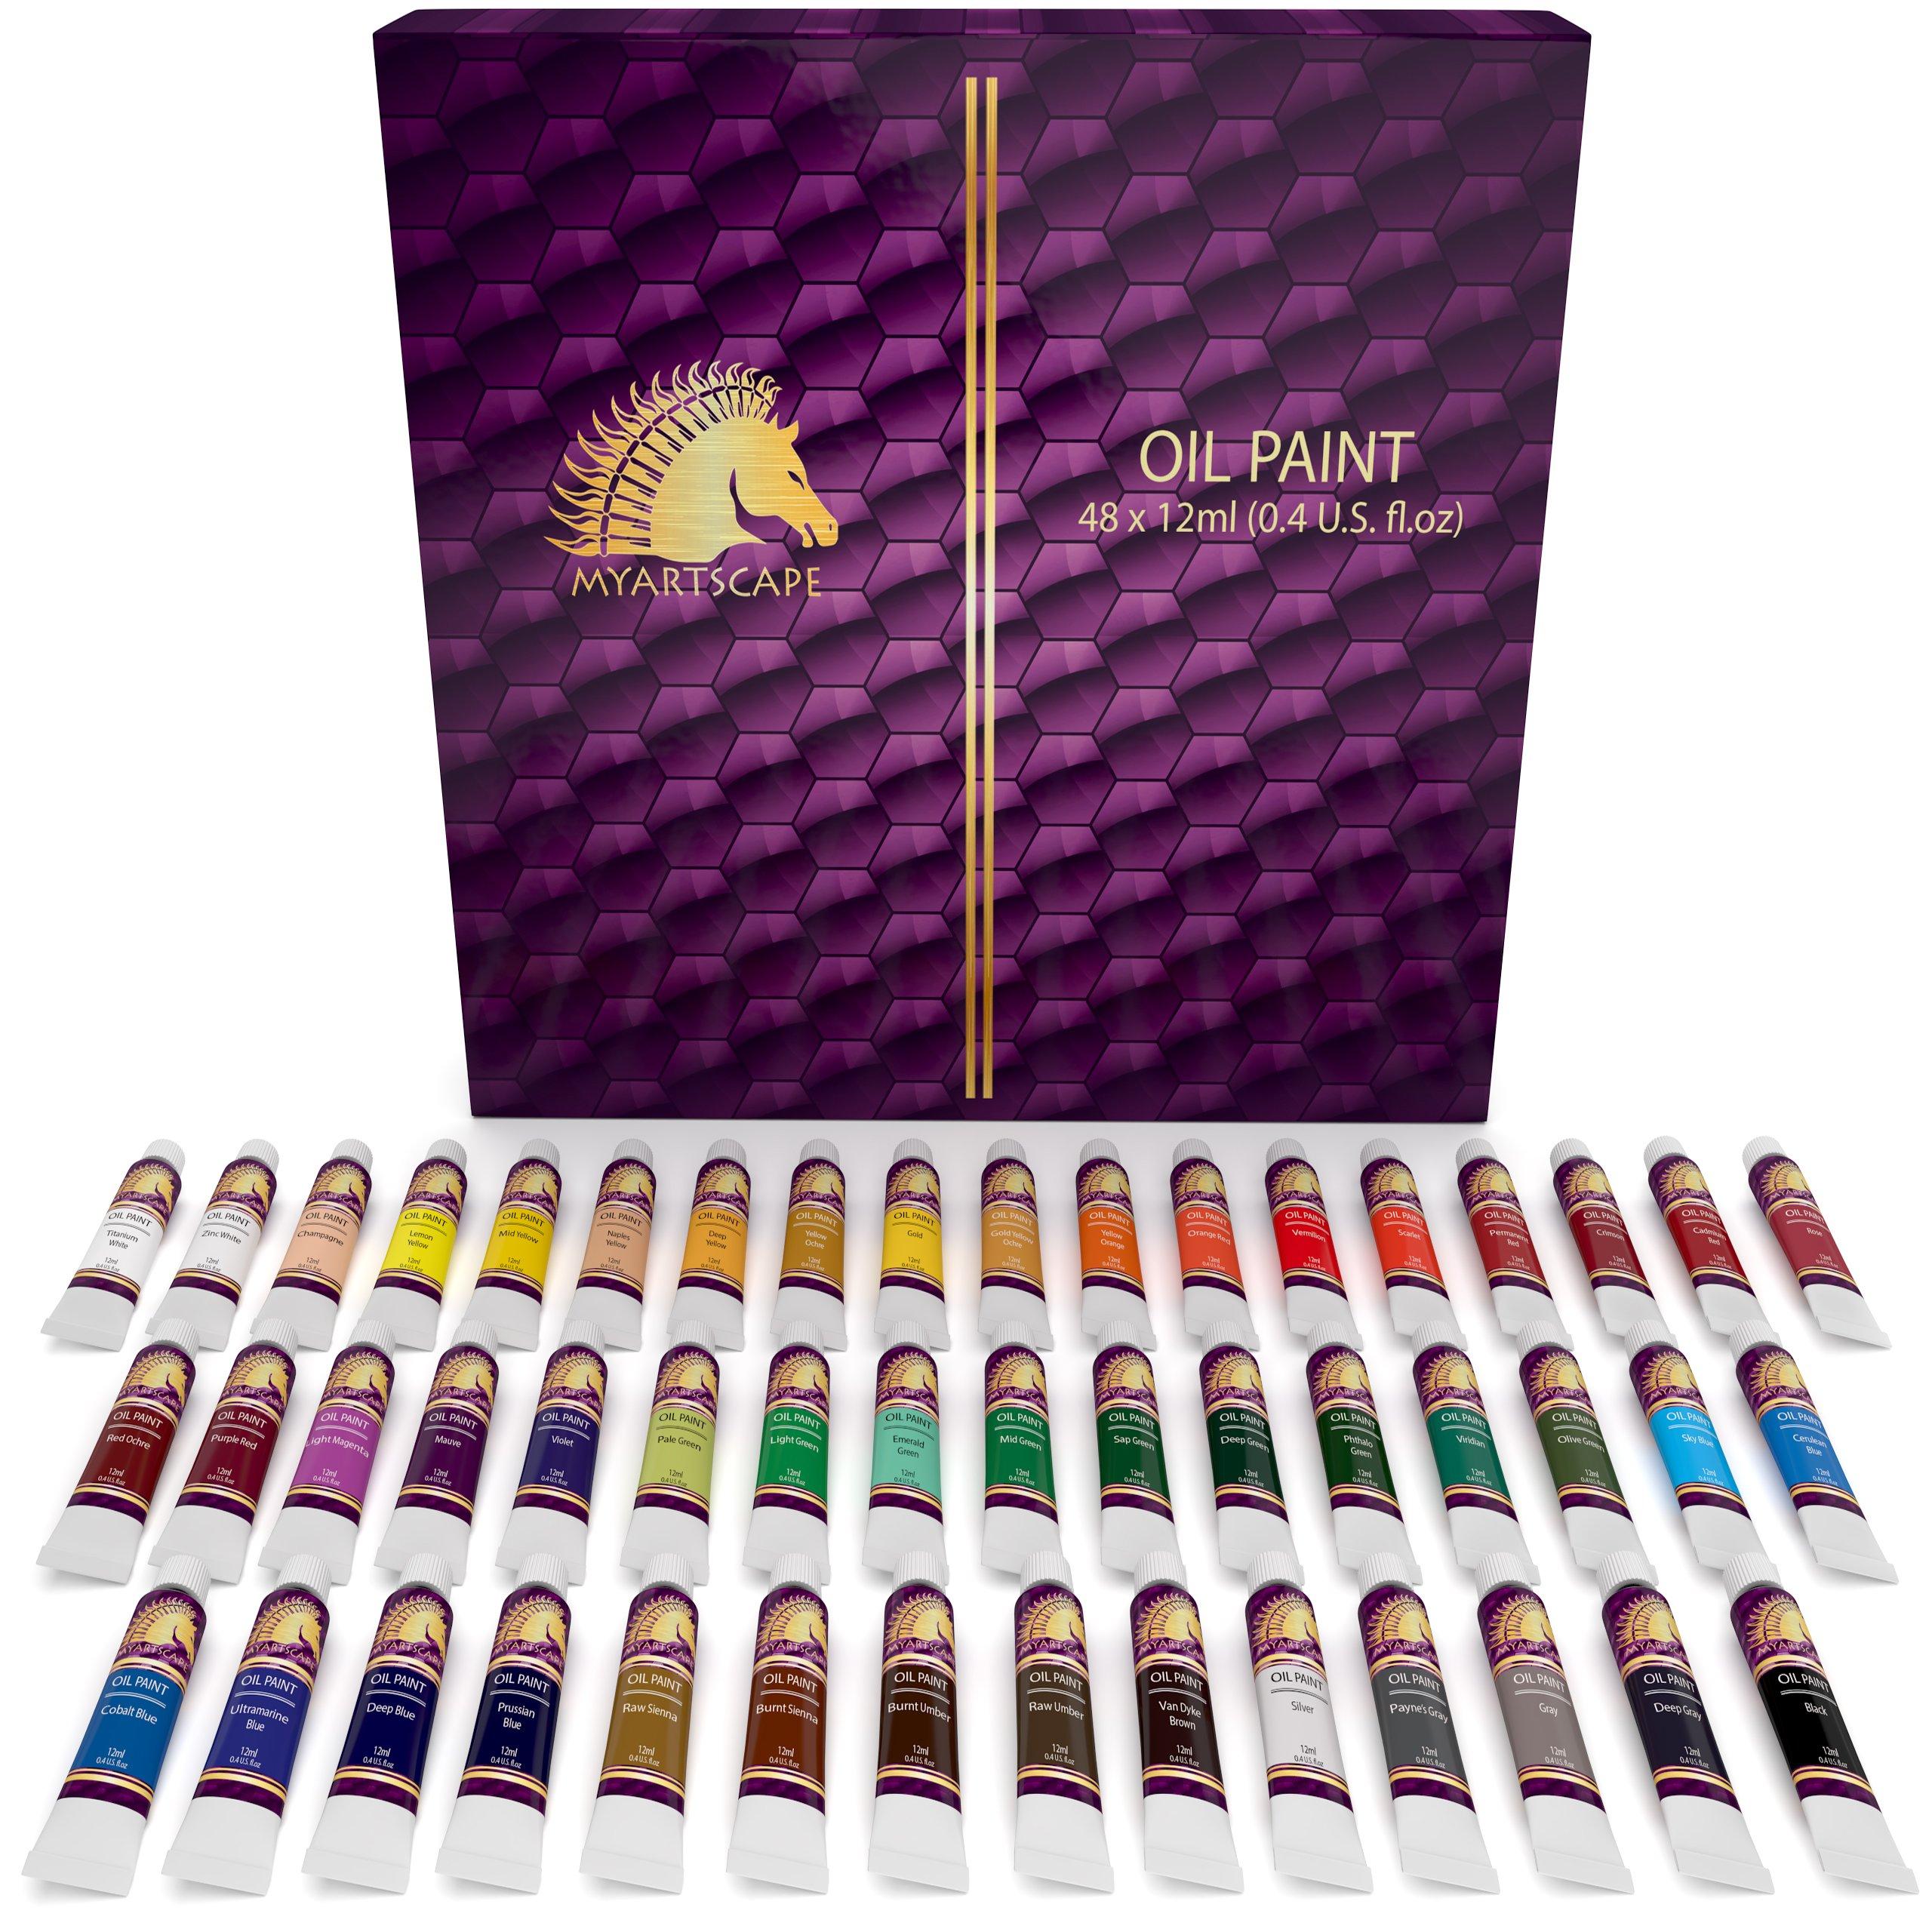 Oil Paint Set - 12ml x 48 Tubes - Artists Quality Art Paints - Oil-Based Color - Professional Painting Supplies - MyArtscape